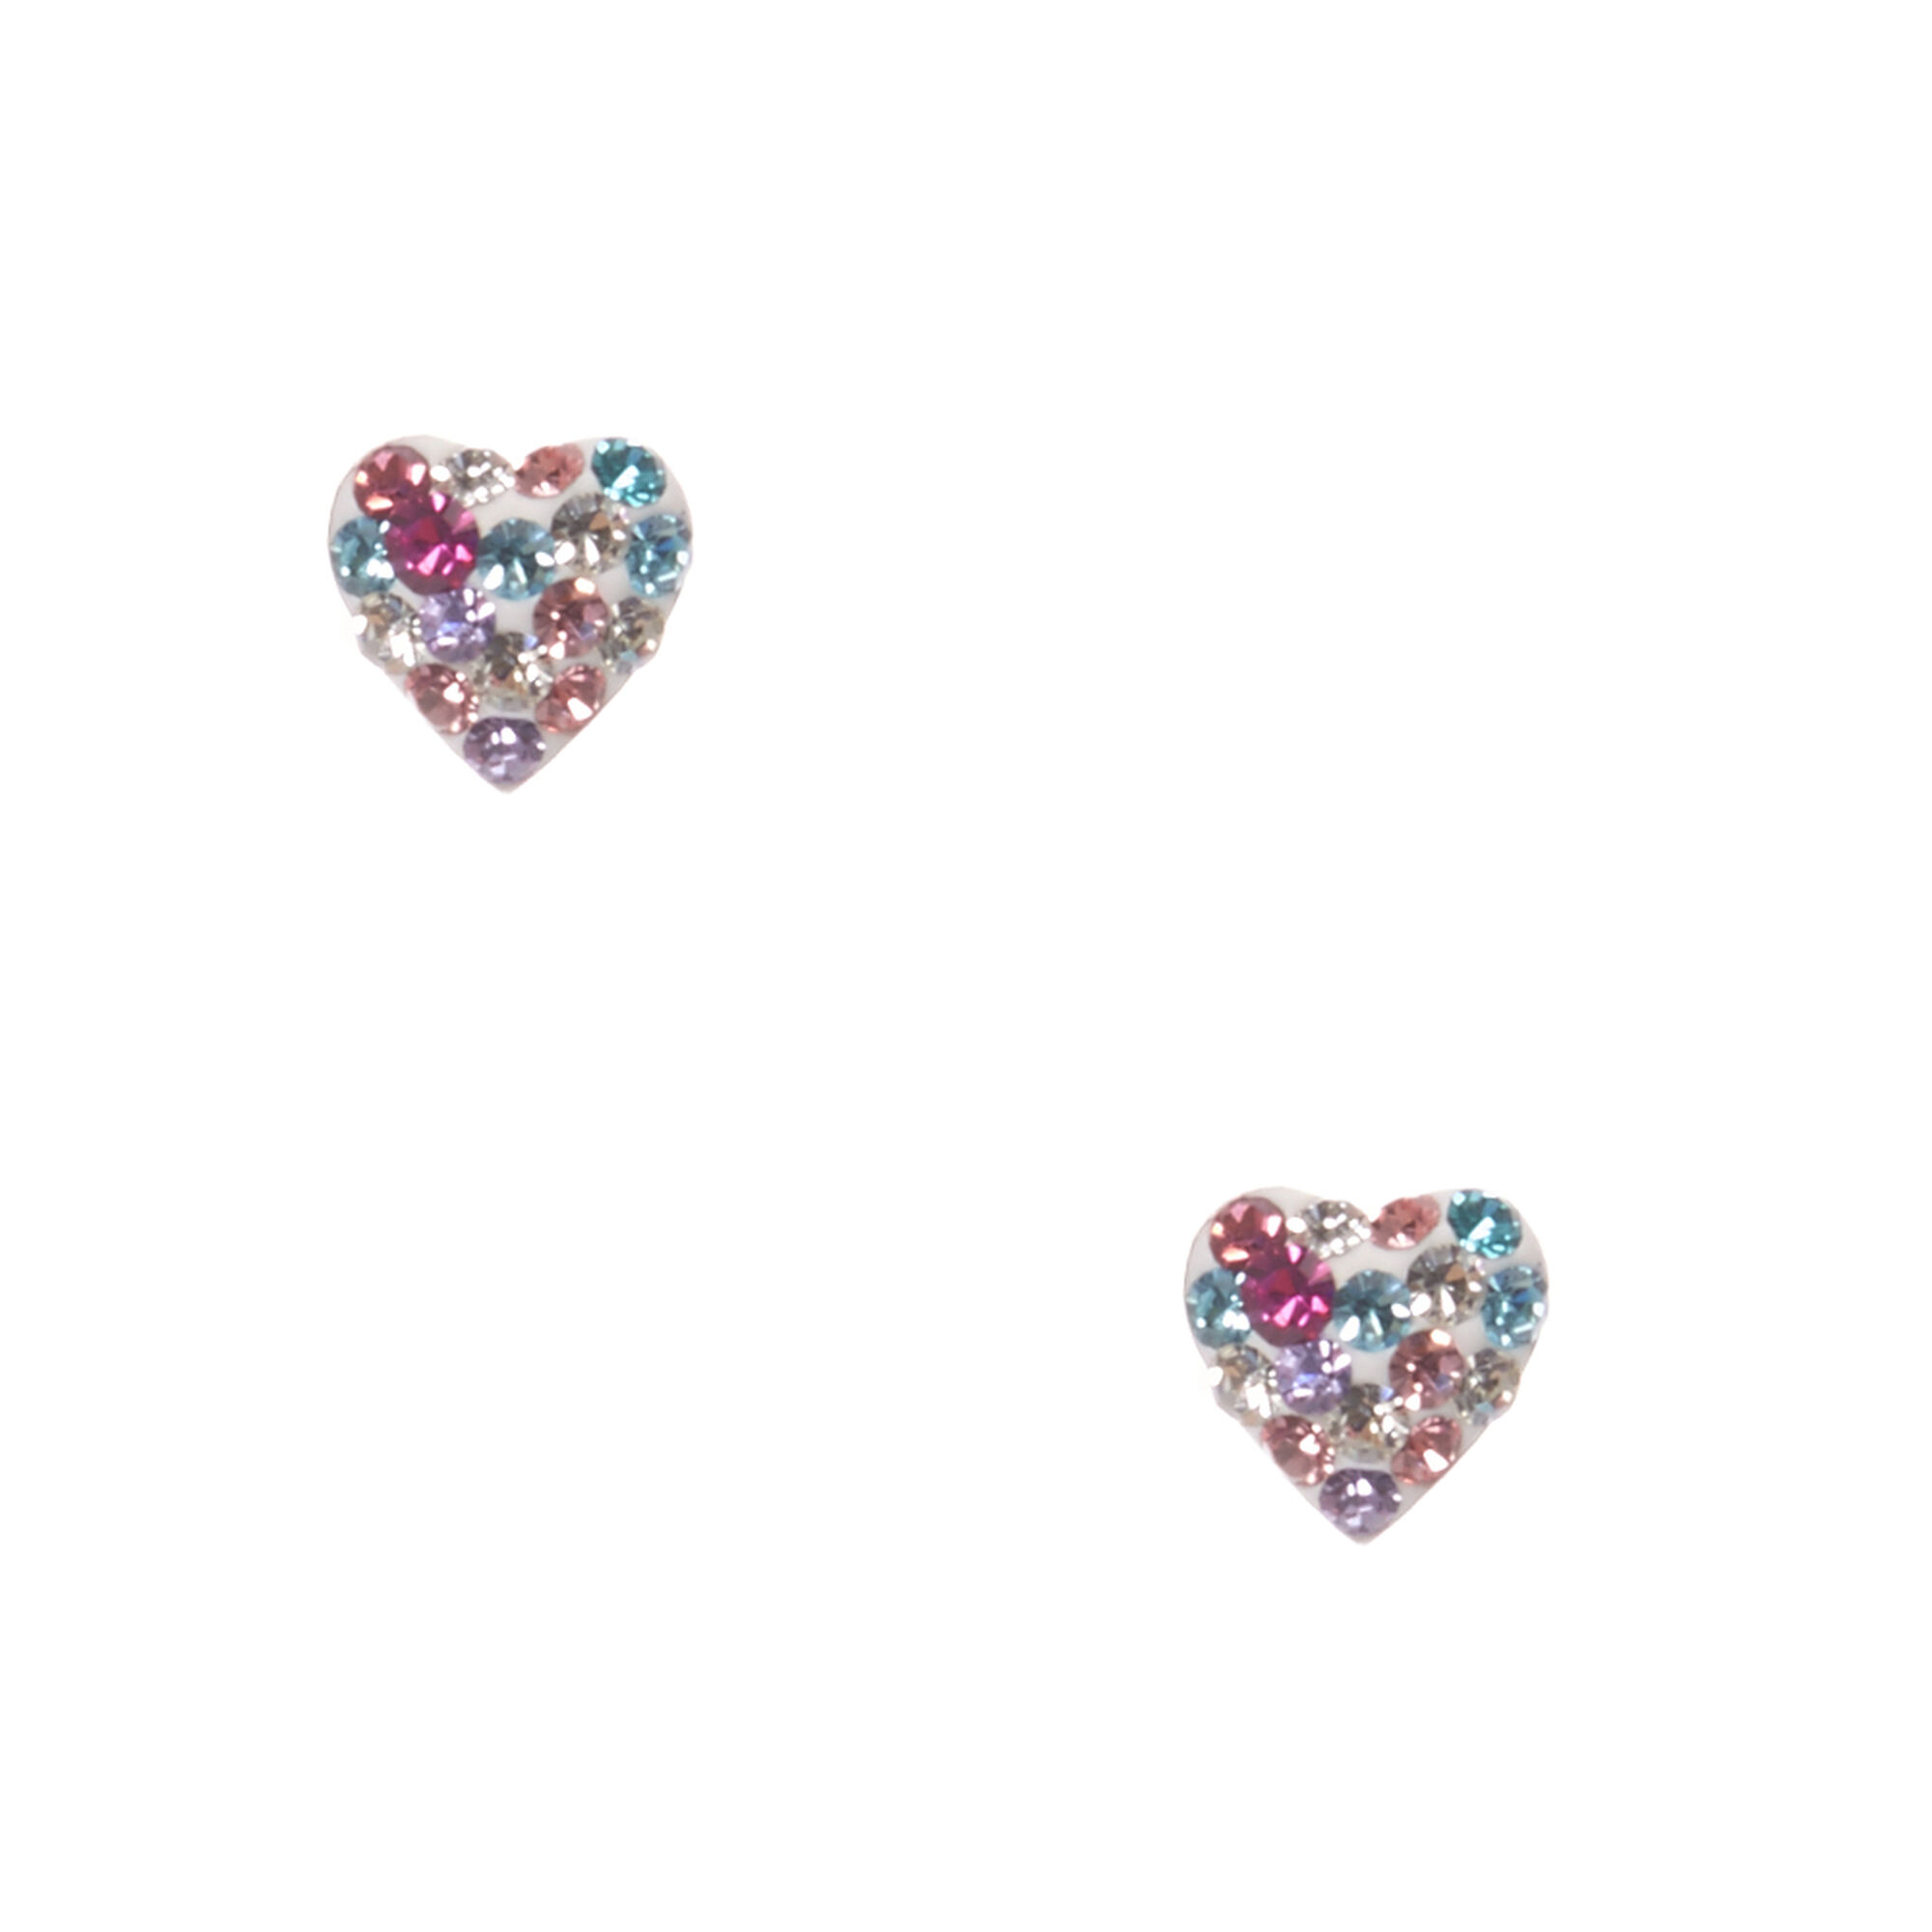 Kids My First Earrings Pastel Crystal Heart Stud